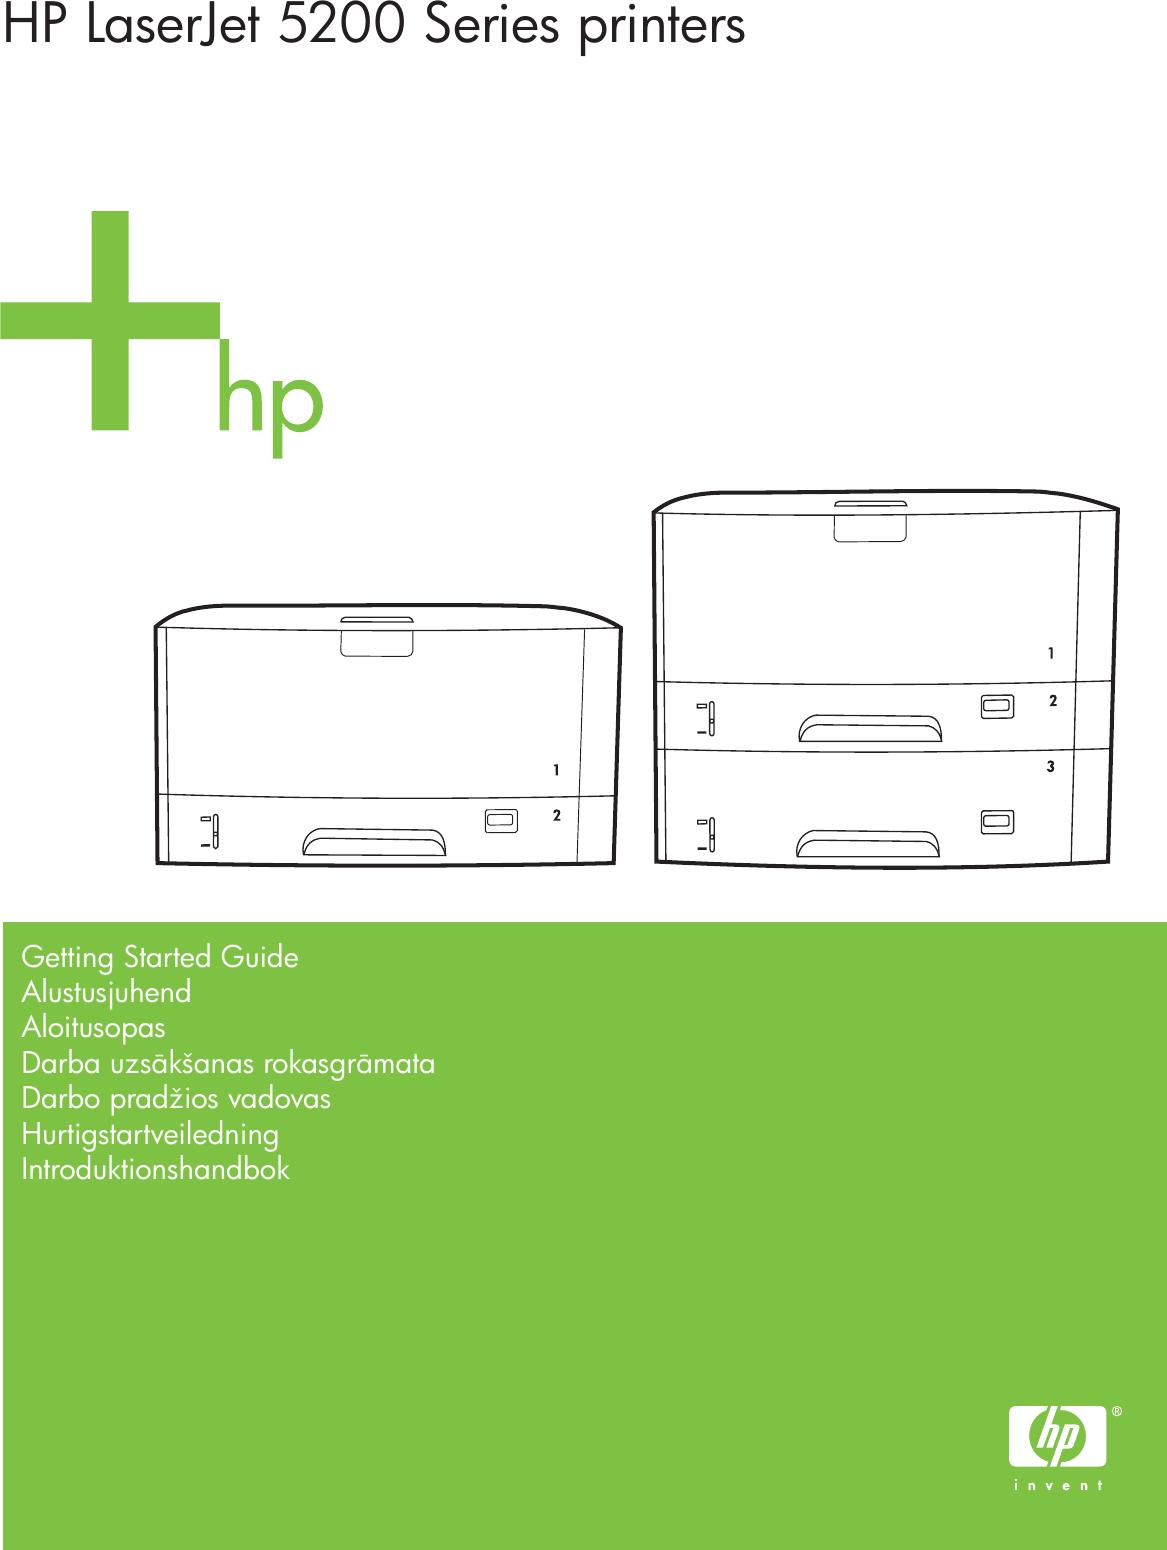 hp laserjet 5200 start xlww laser jet series printer getting started rh usermanual wiki hp laserjet 5200 printer manual HP 5200 Driver